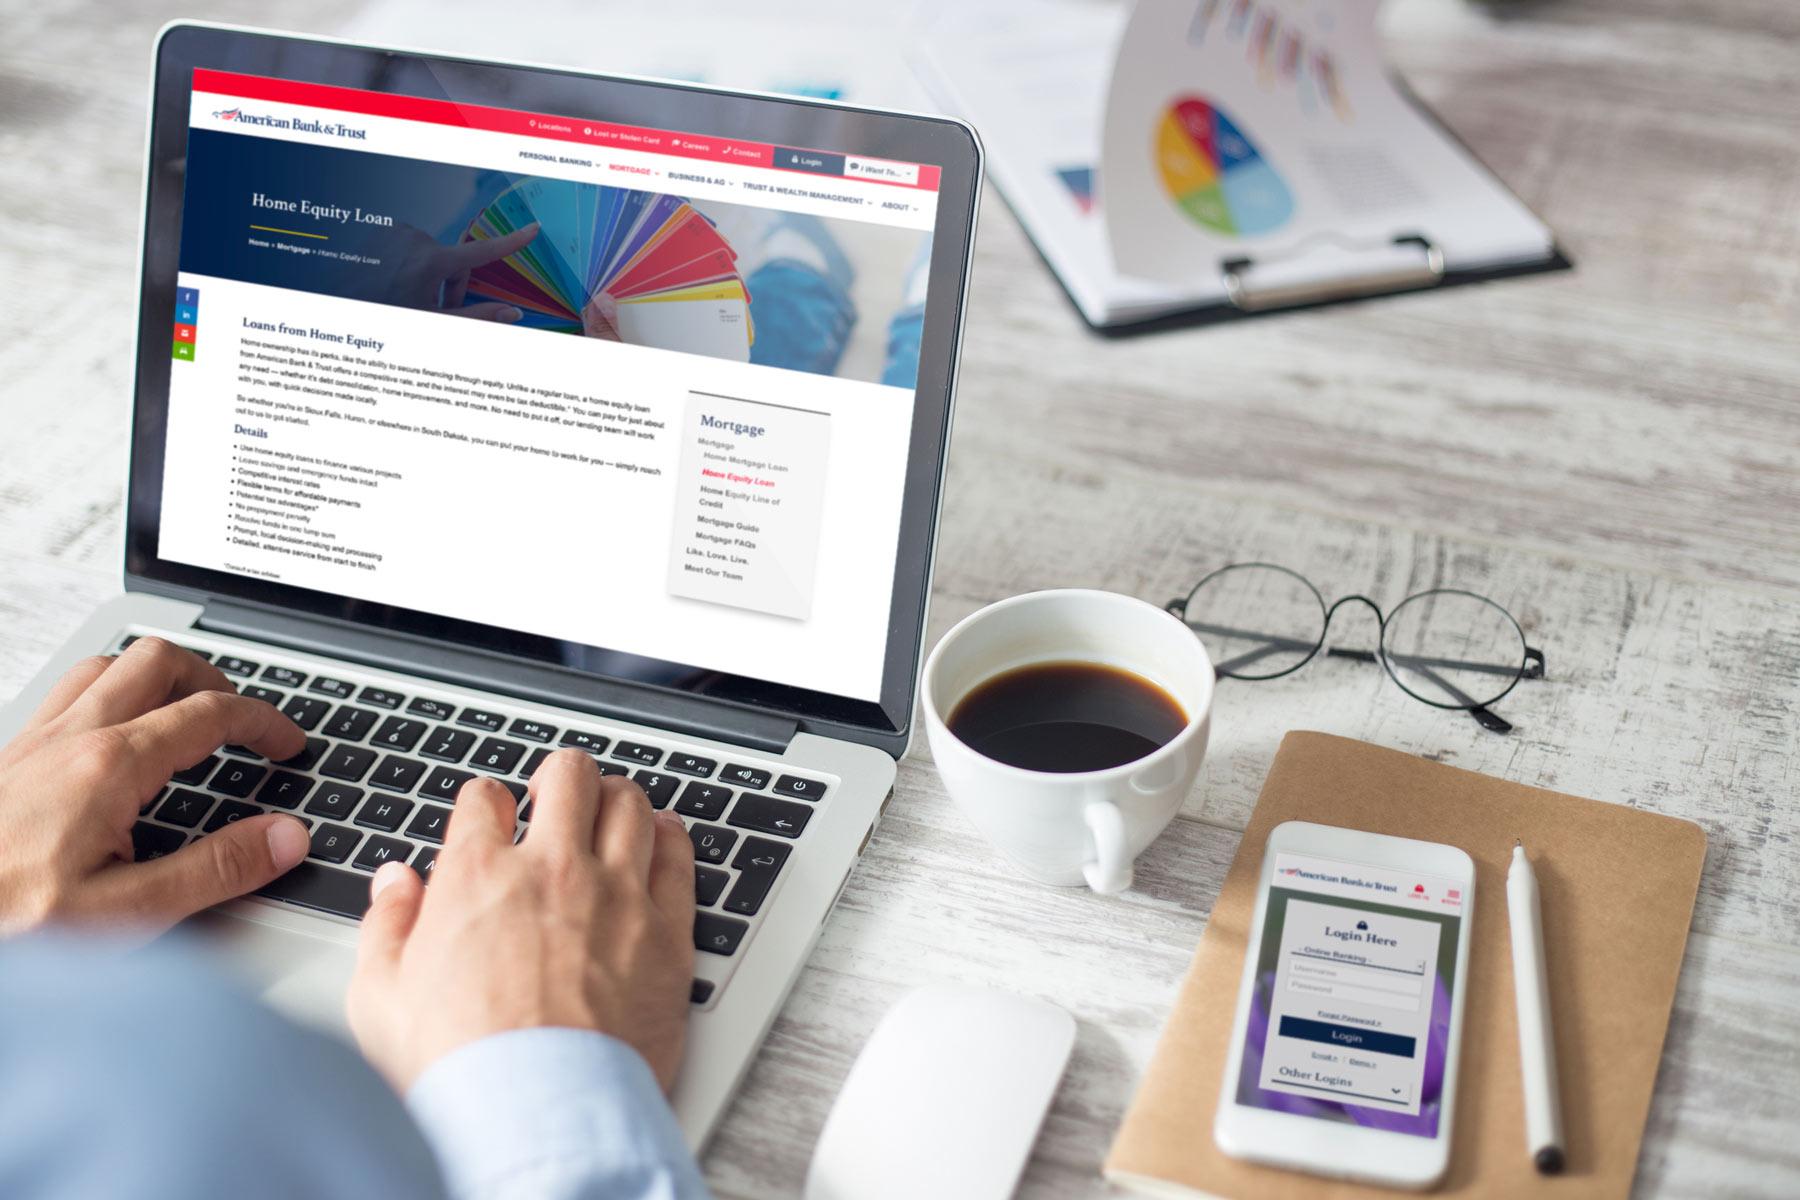 bank website on computer